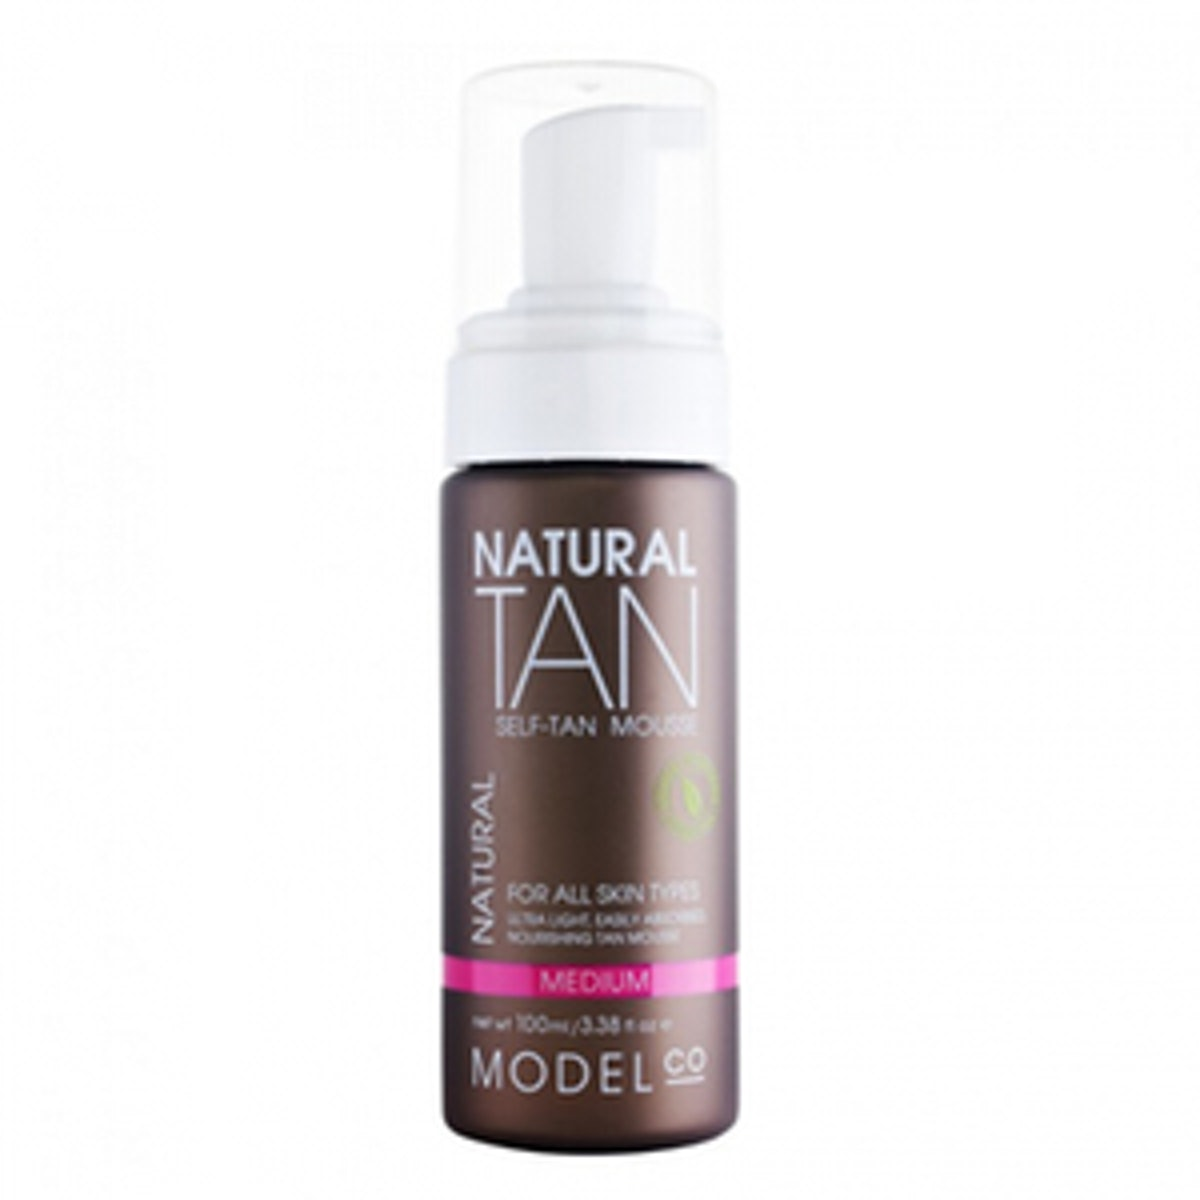 Natural Tan Self-Tan Mousse